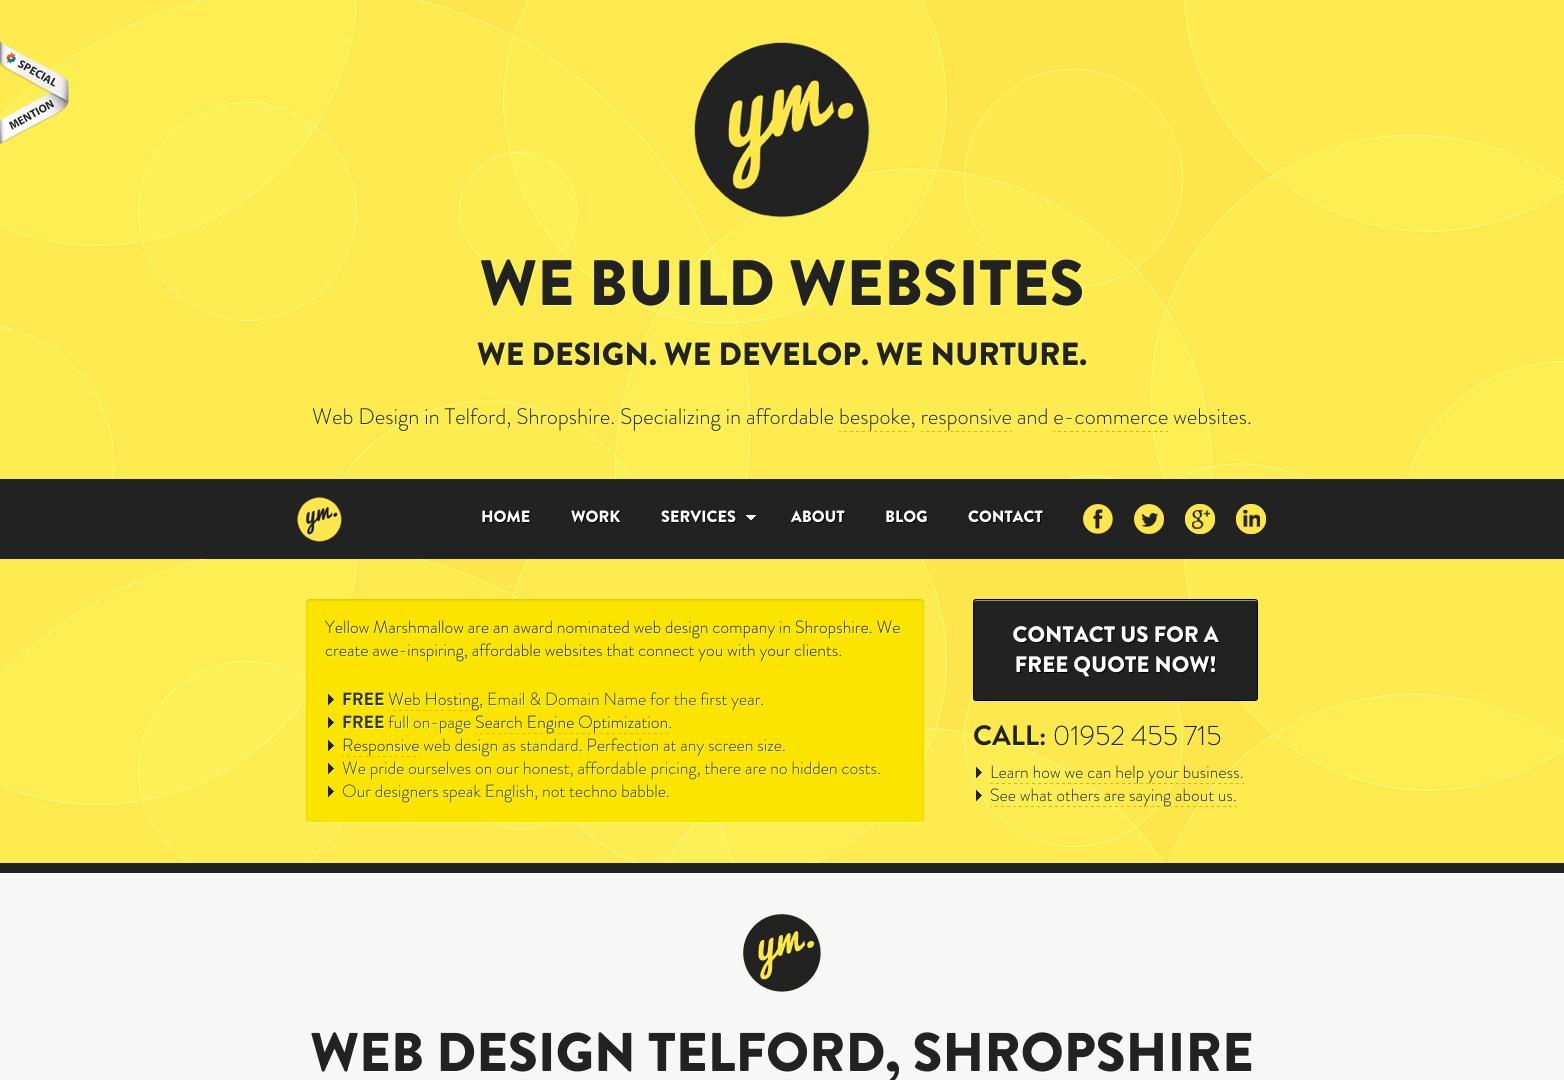 Web Design Telford | Web Design Shropshire | Žlutá Marshmallow